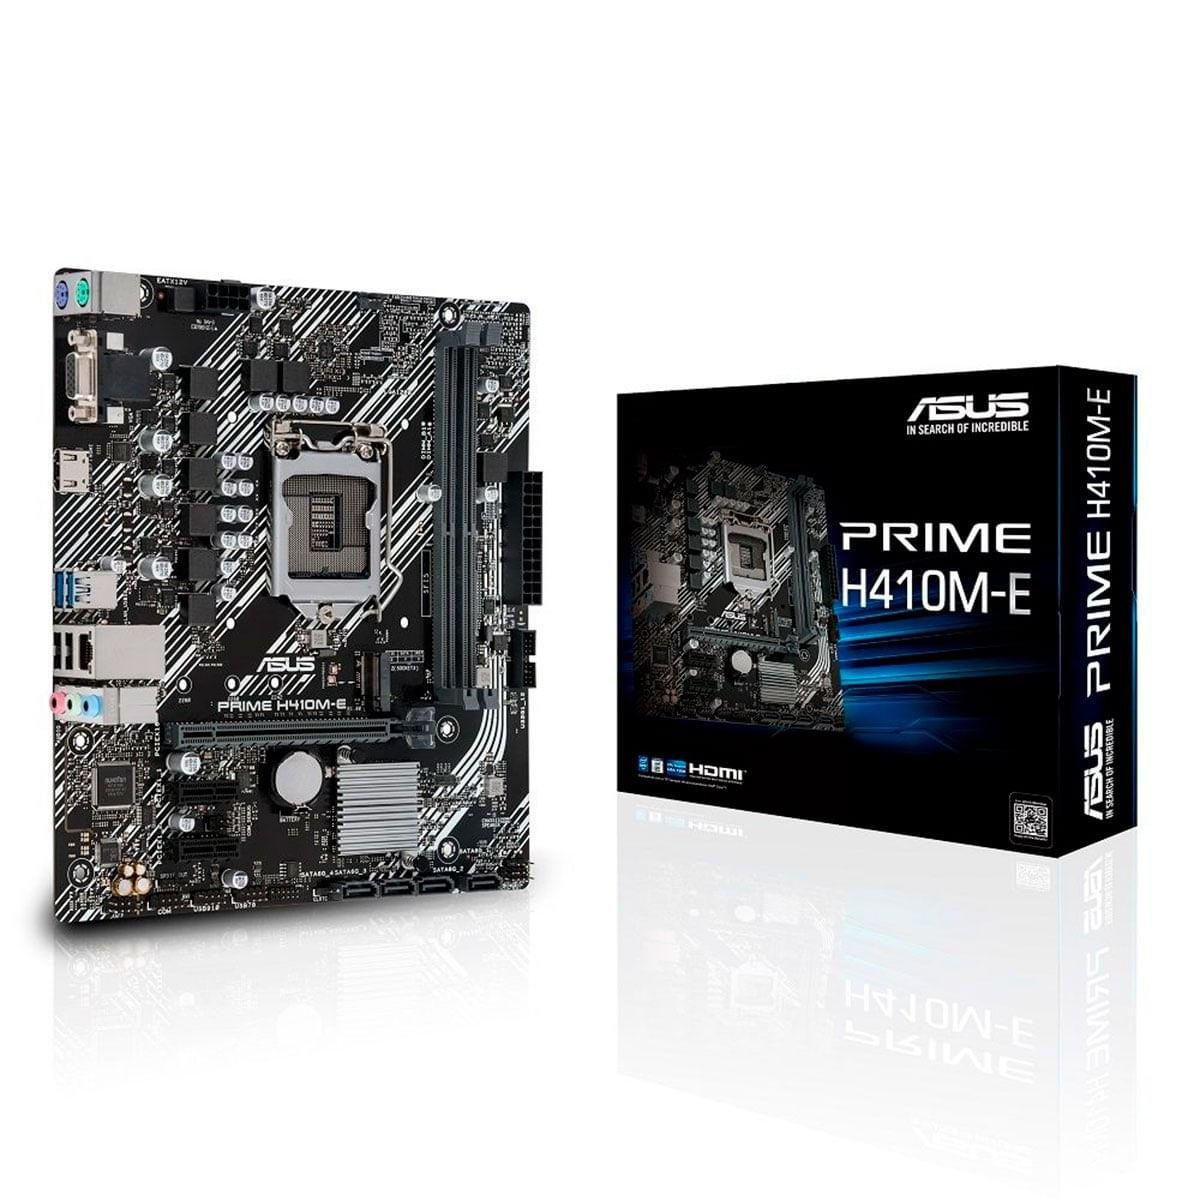 Imagem de Placa Mãe Asus Prime H410M-E Intel Ddr4 Lga 1200